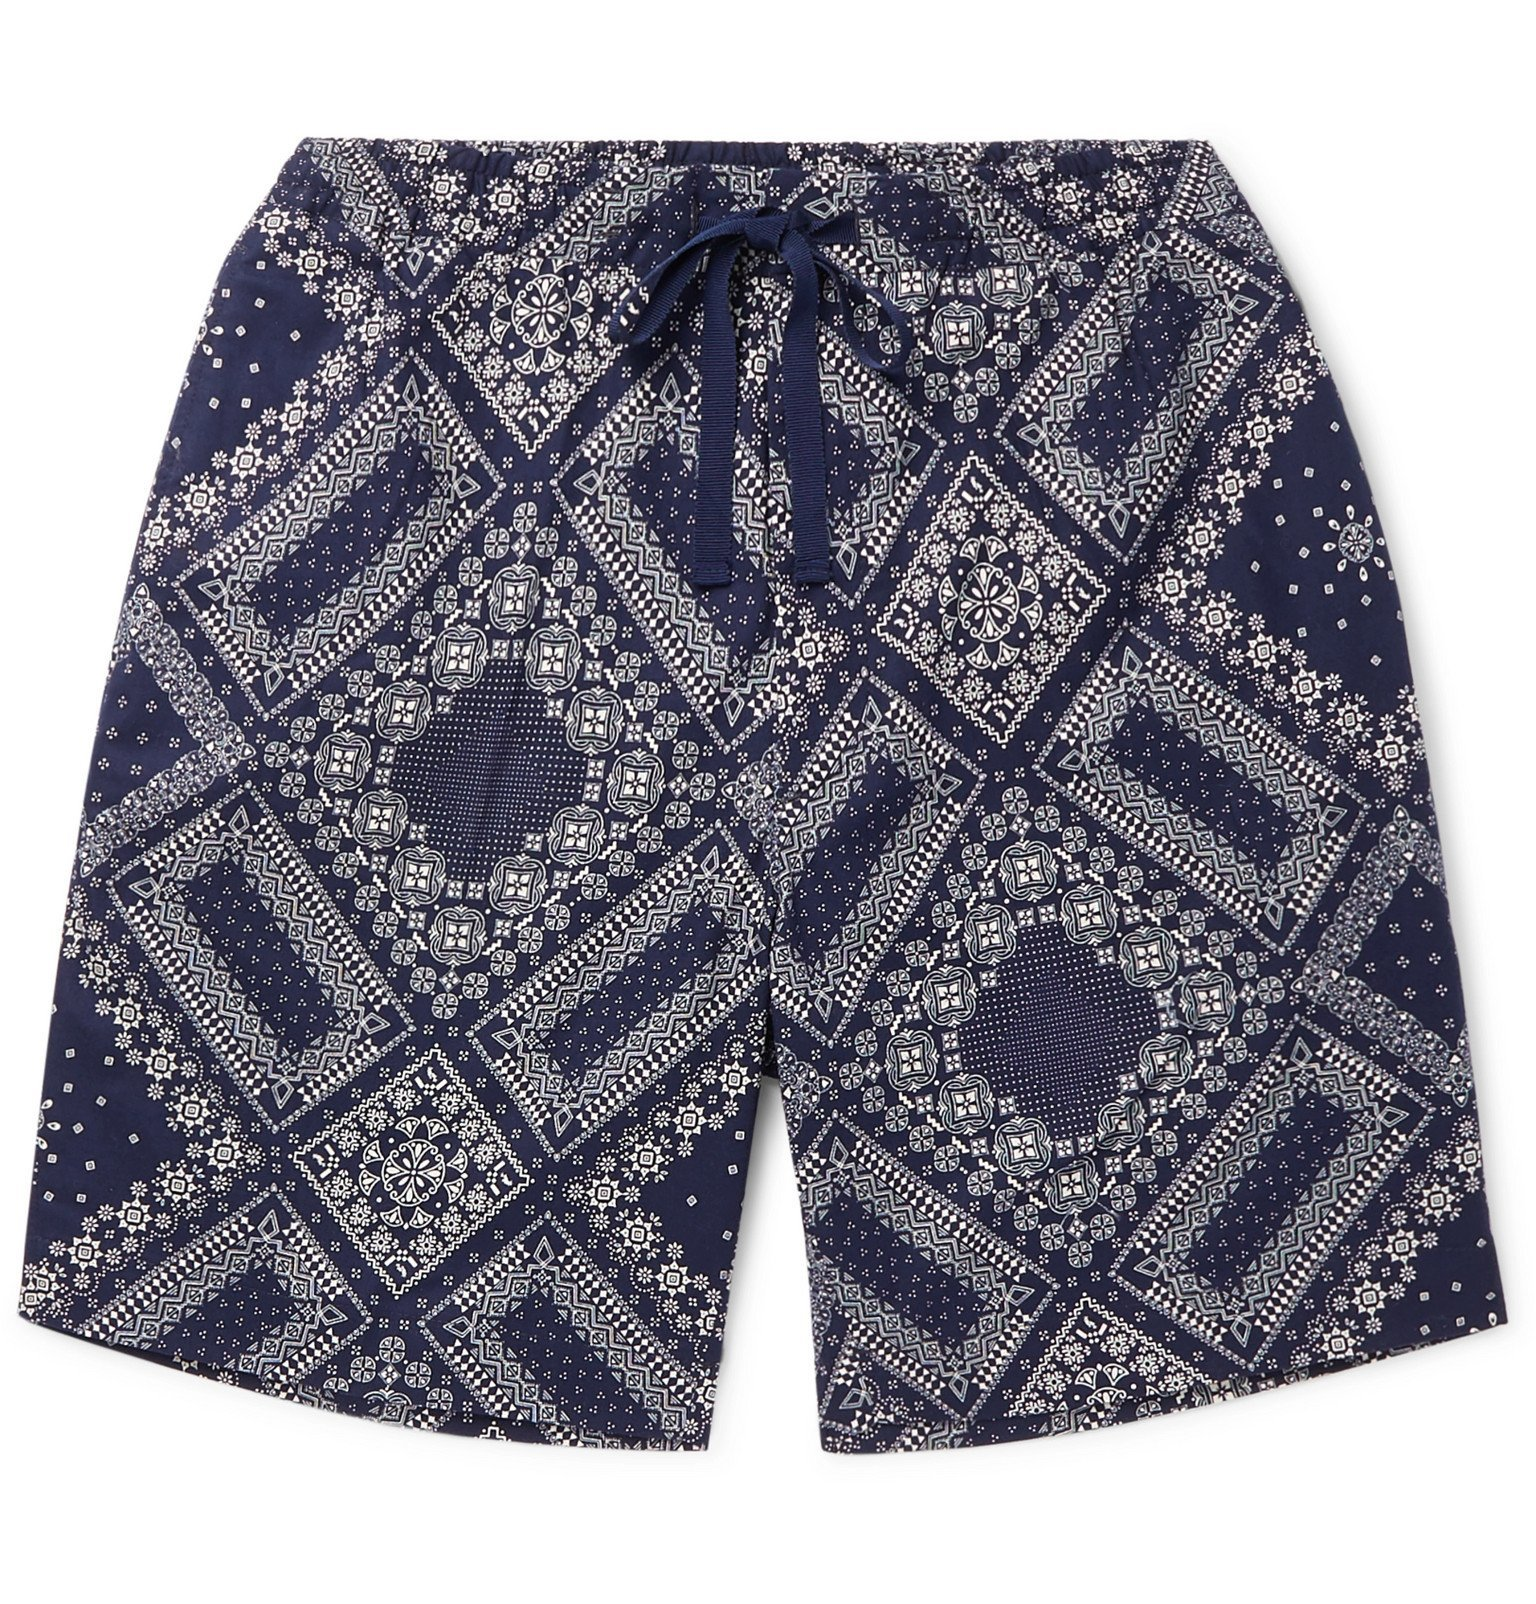 Officine Generale - Phil Slim-Fit Bandana-Print Cotton Drawstring Shorts - Blue